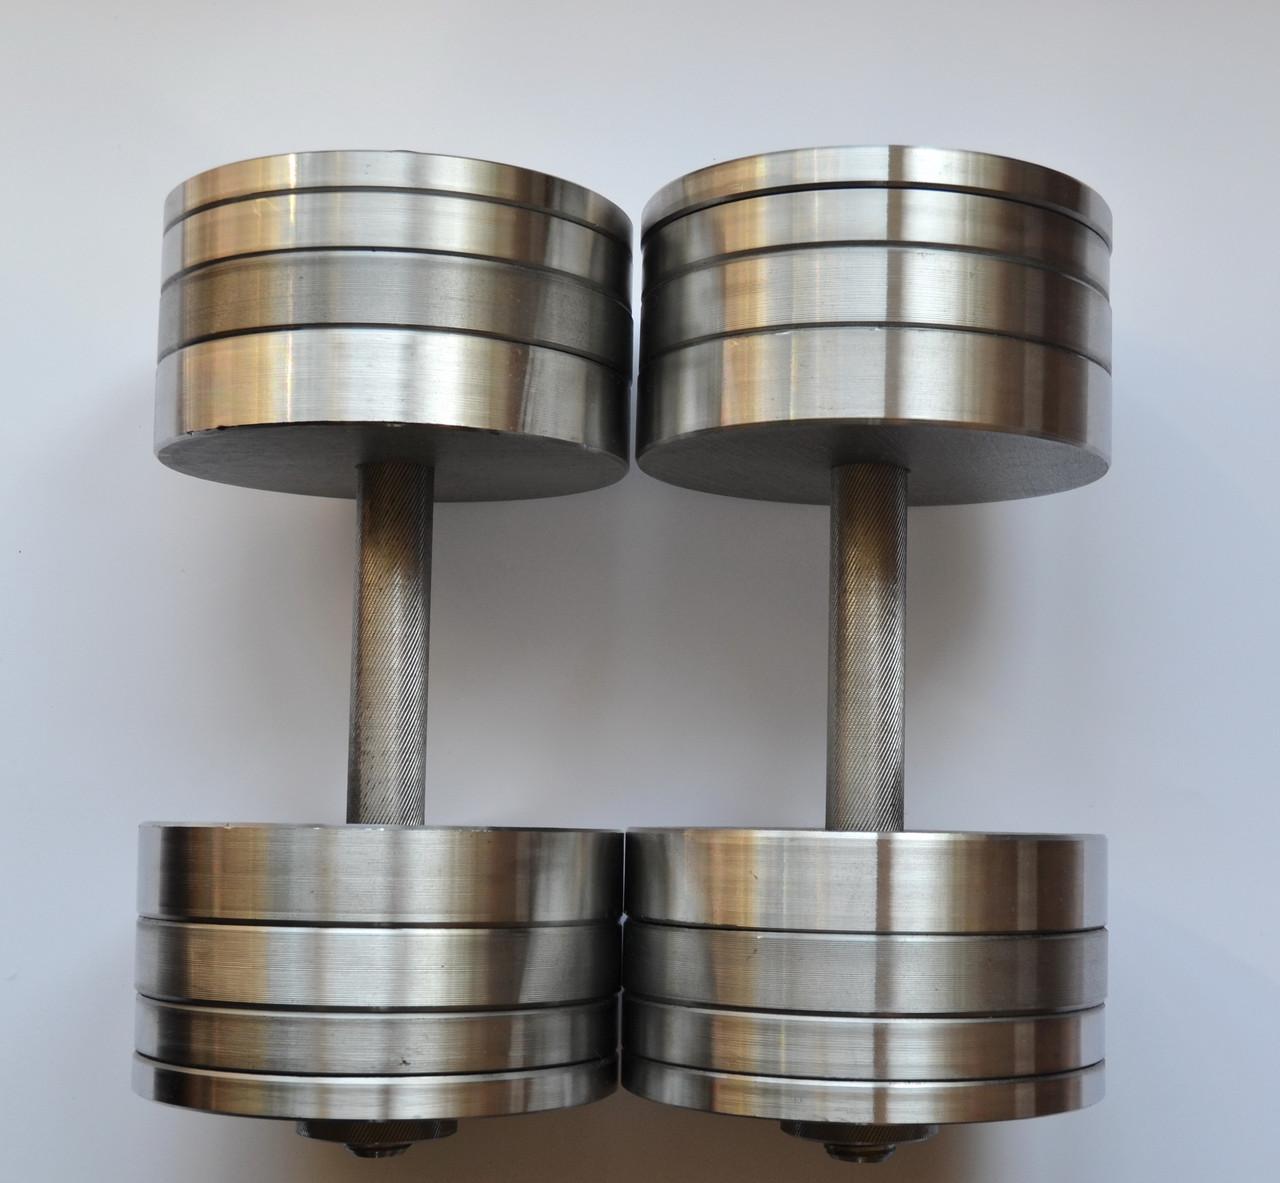 Гантели 2 по 34 кг разборные стальные. Сталеві гантелі